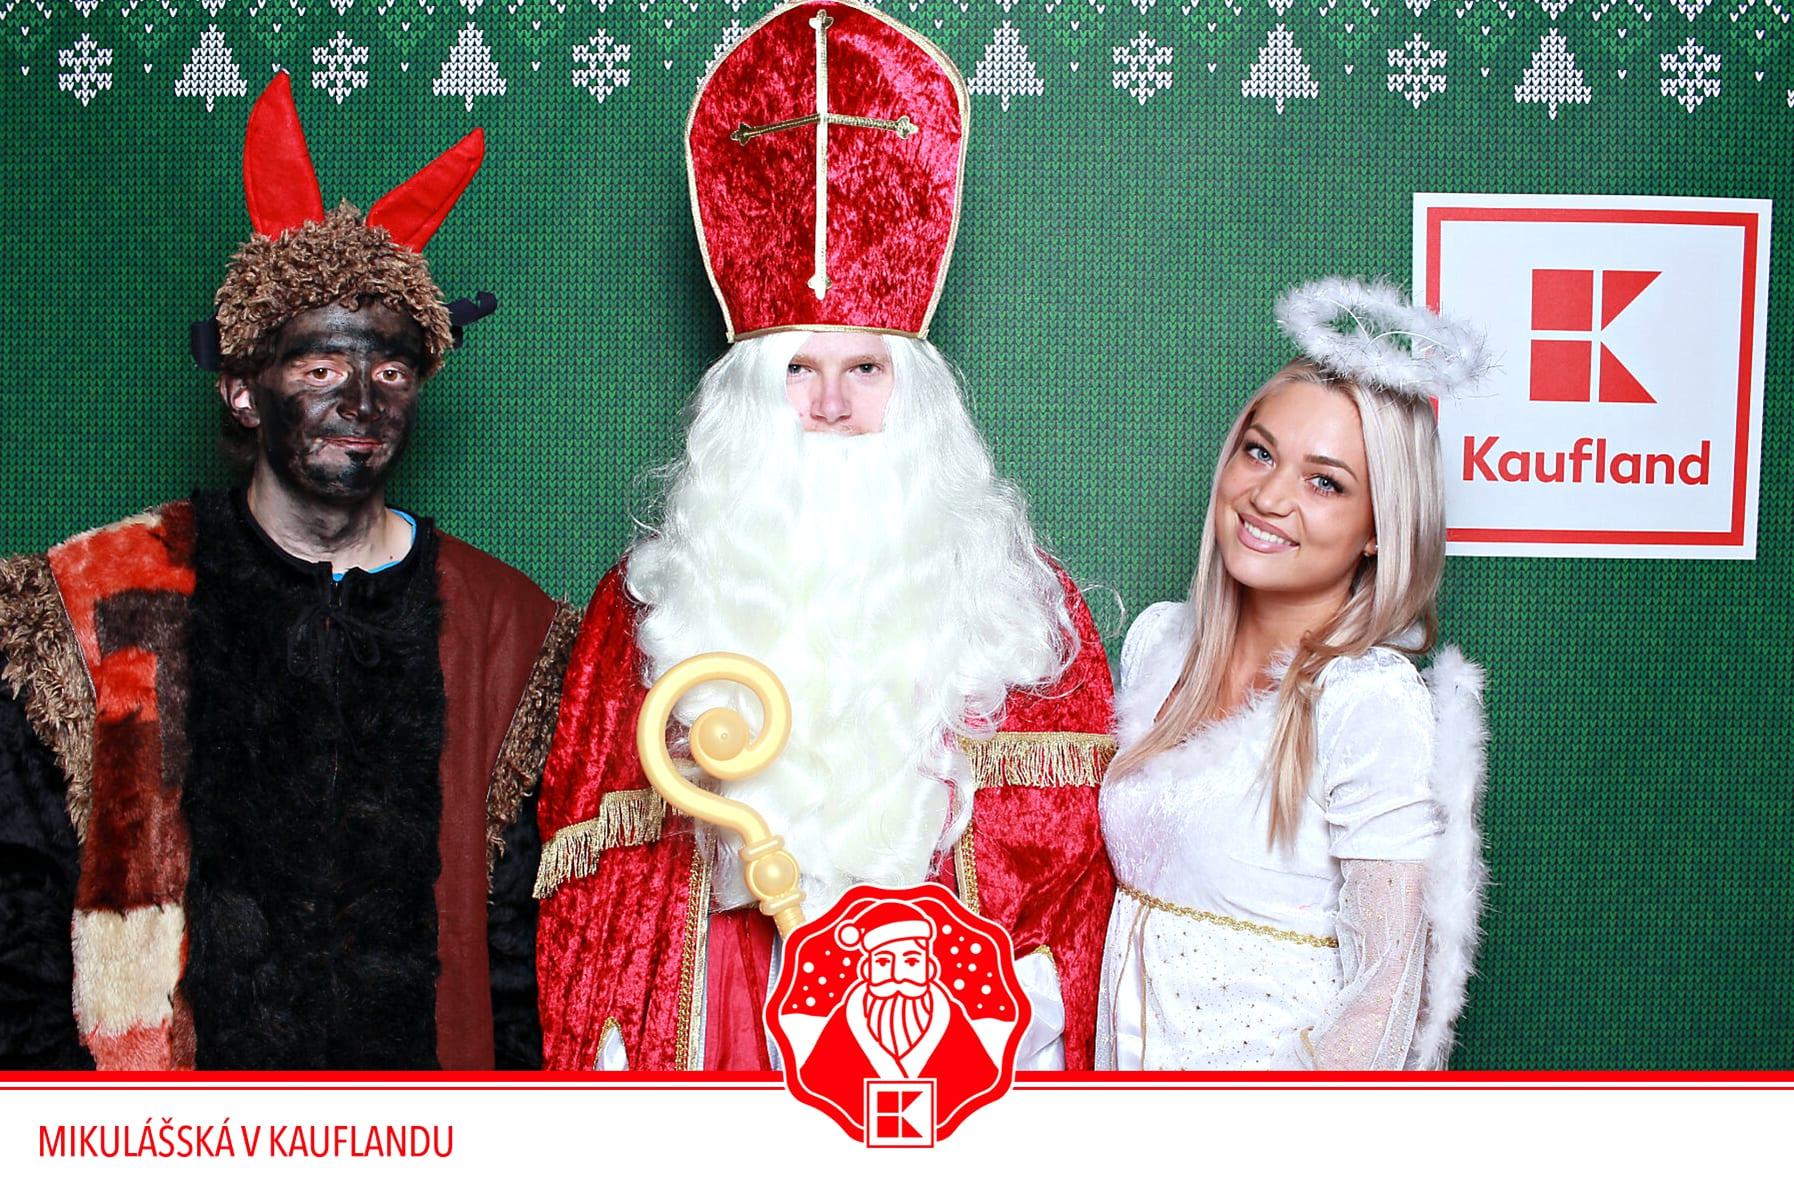 fotokoutek-praha-promo-akce-mikulasska-v-kauflandu-horni-mecholupy-5-12-2018-532960